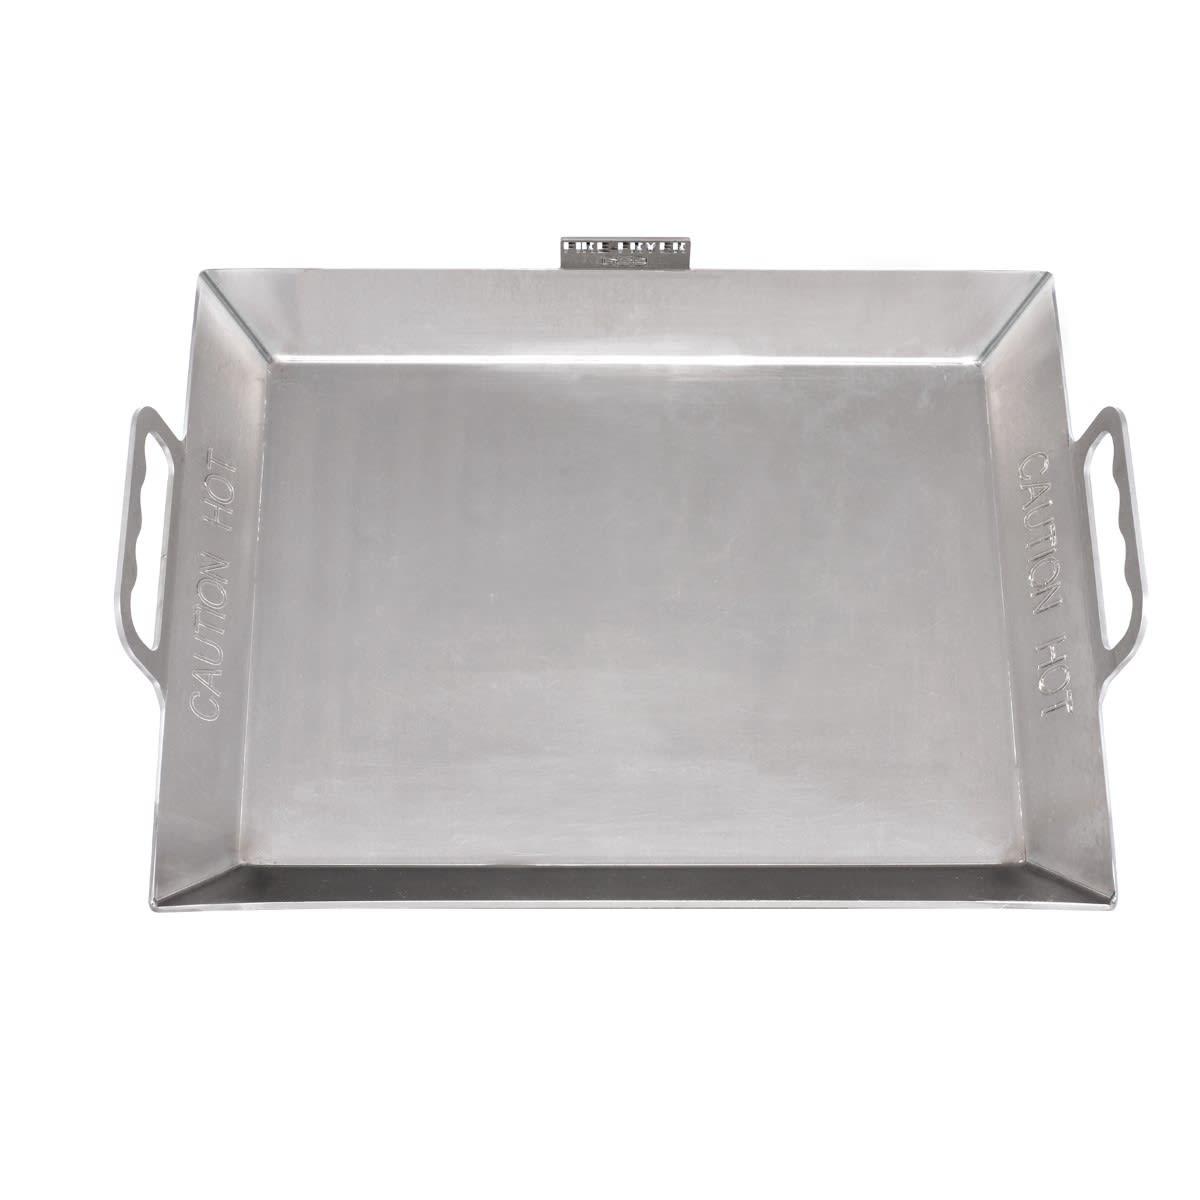 Stainless Steel Fire Fryer Braai Pan